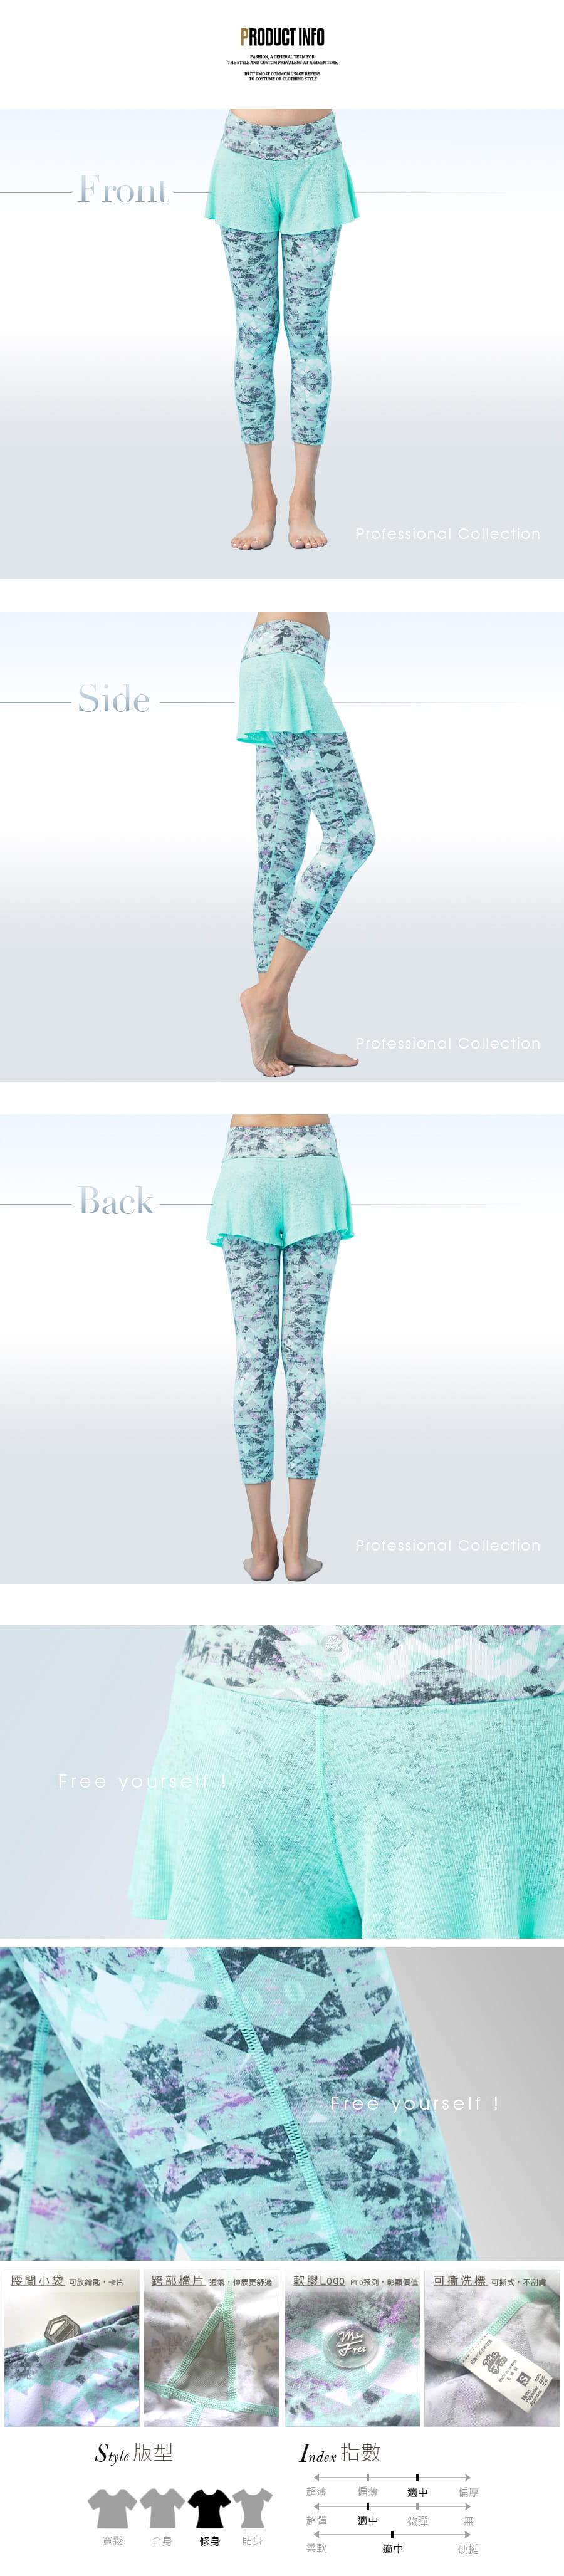 【Ms.Free】Pro高階-台灣製褲裙式假兩件機能八分褲(瑜珈/跳舞/健身)翹臀UP 3